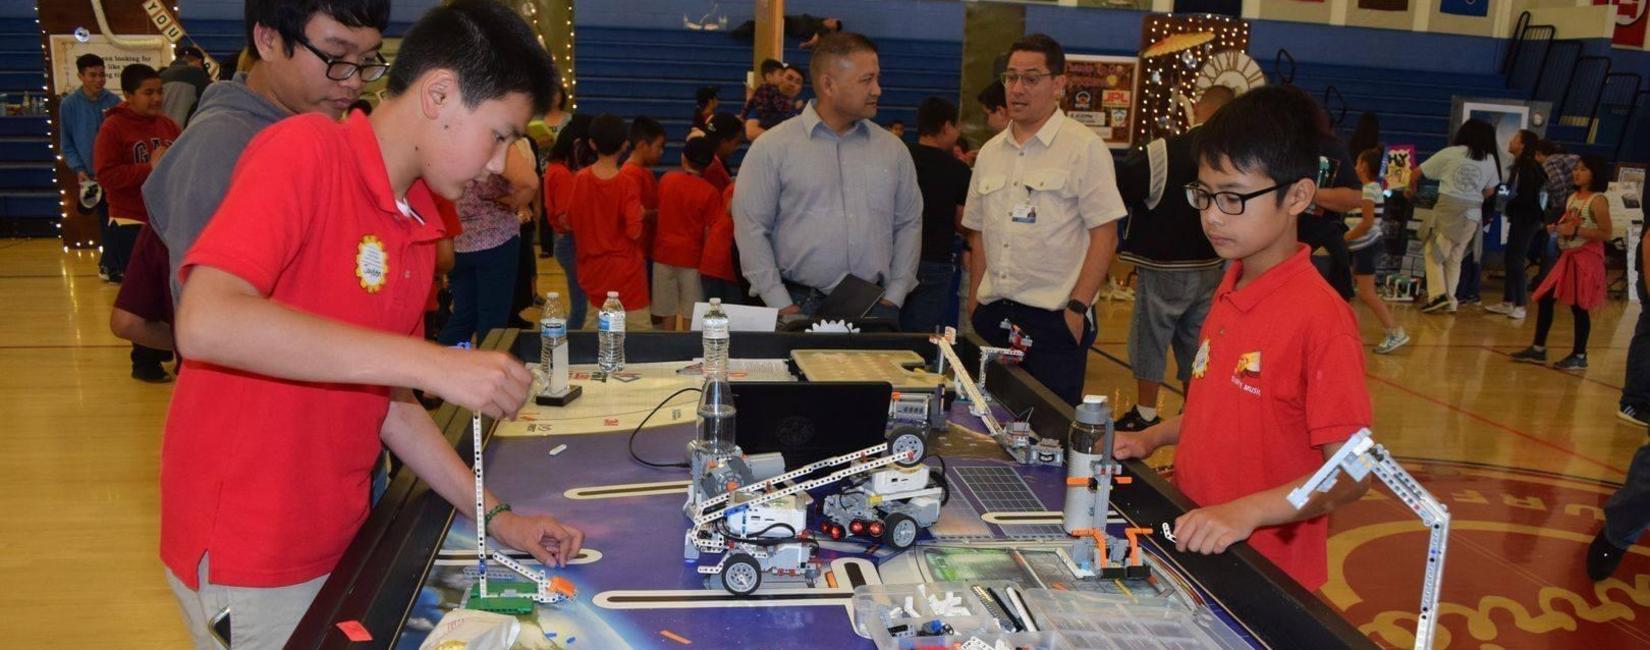 EMCSD Robotics/Gate team showcasing their lego engineering